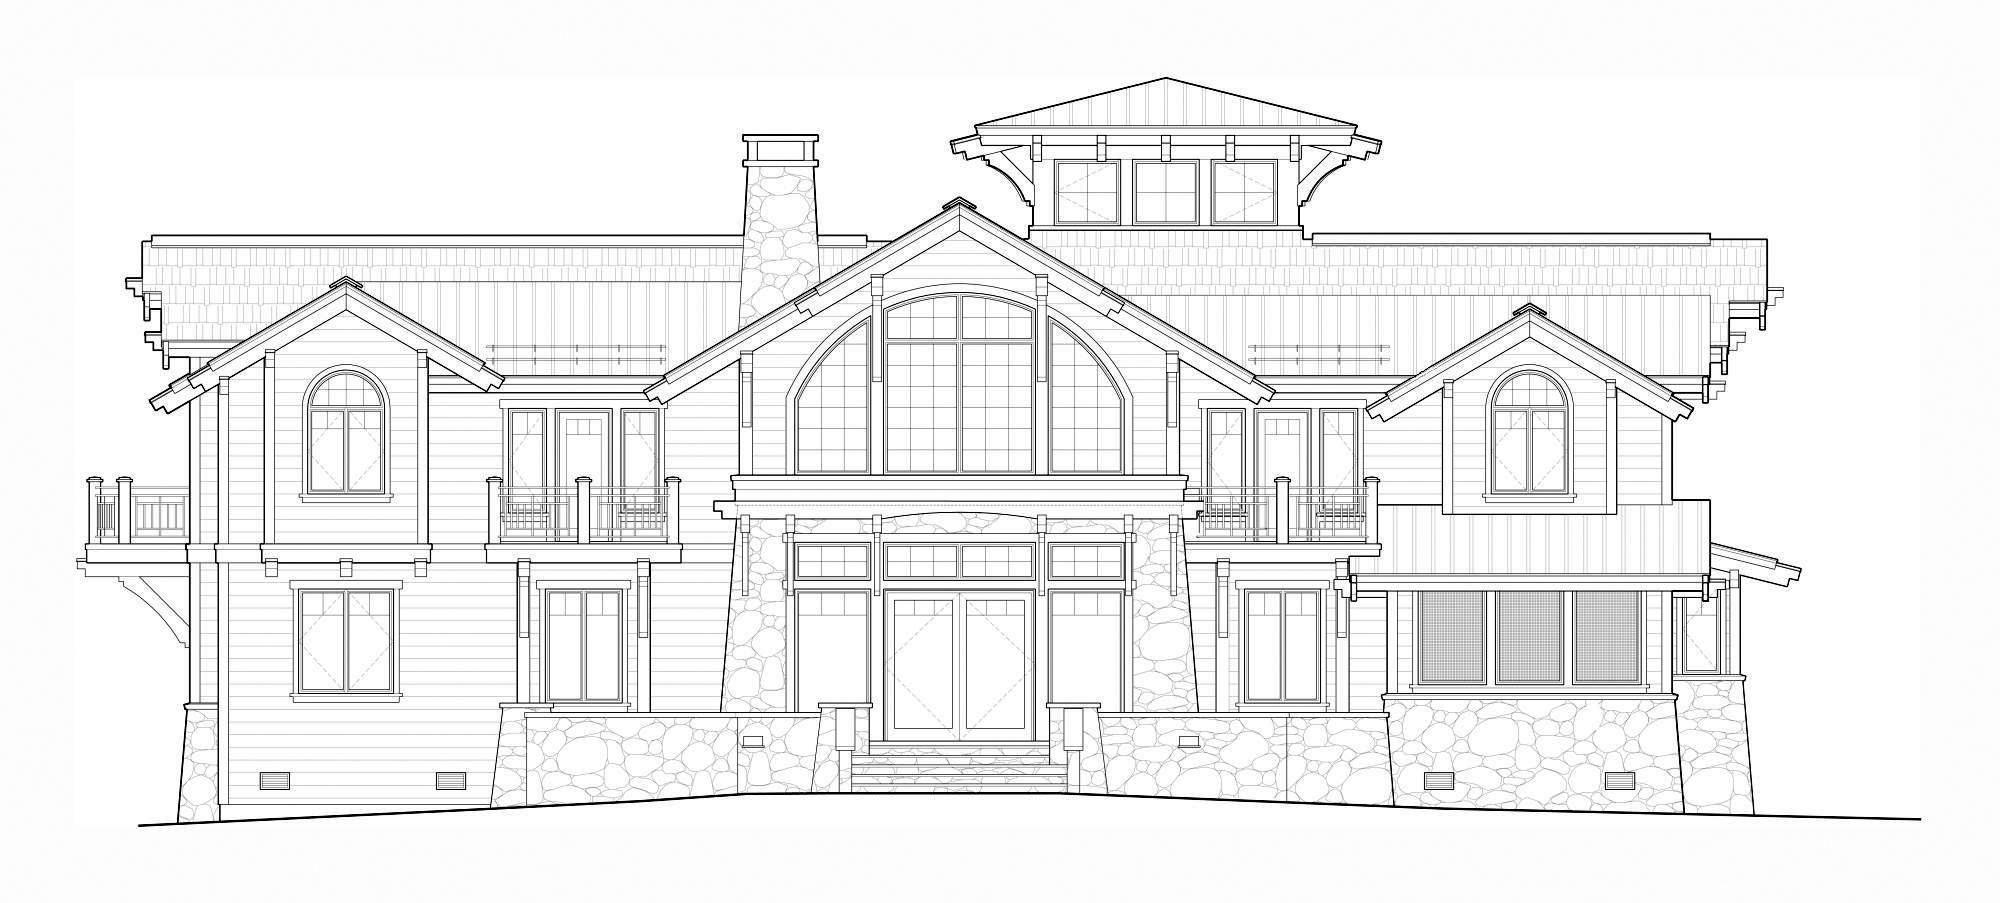 Designing Mountain Architects Hendricks Architecture Idaho